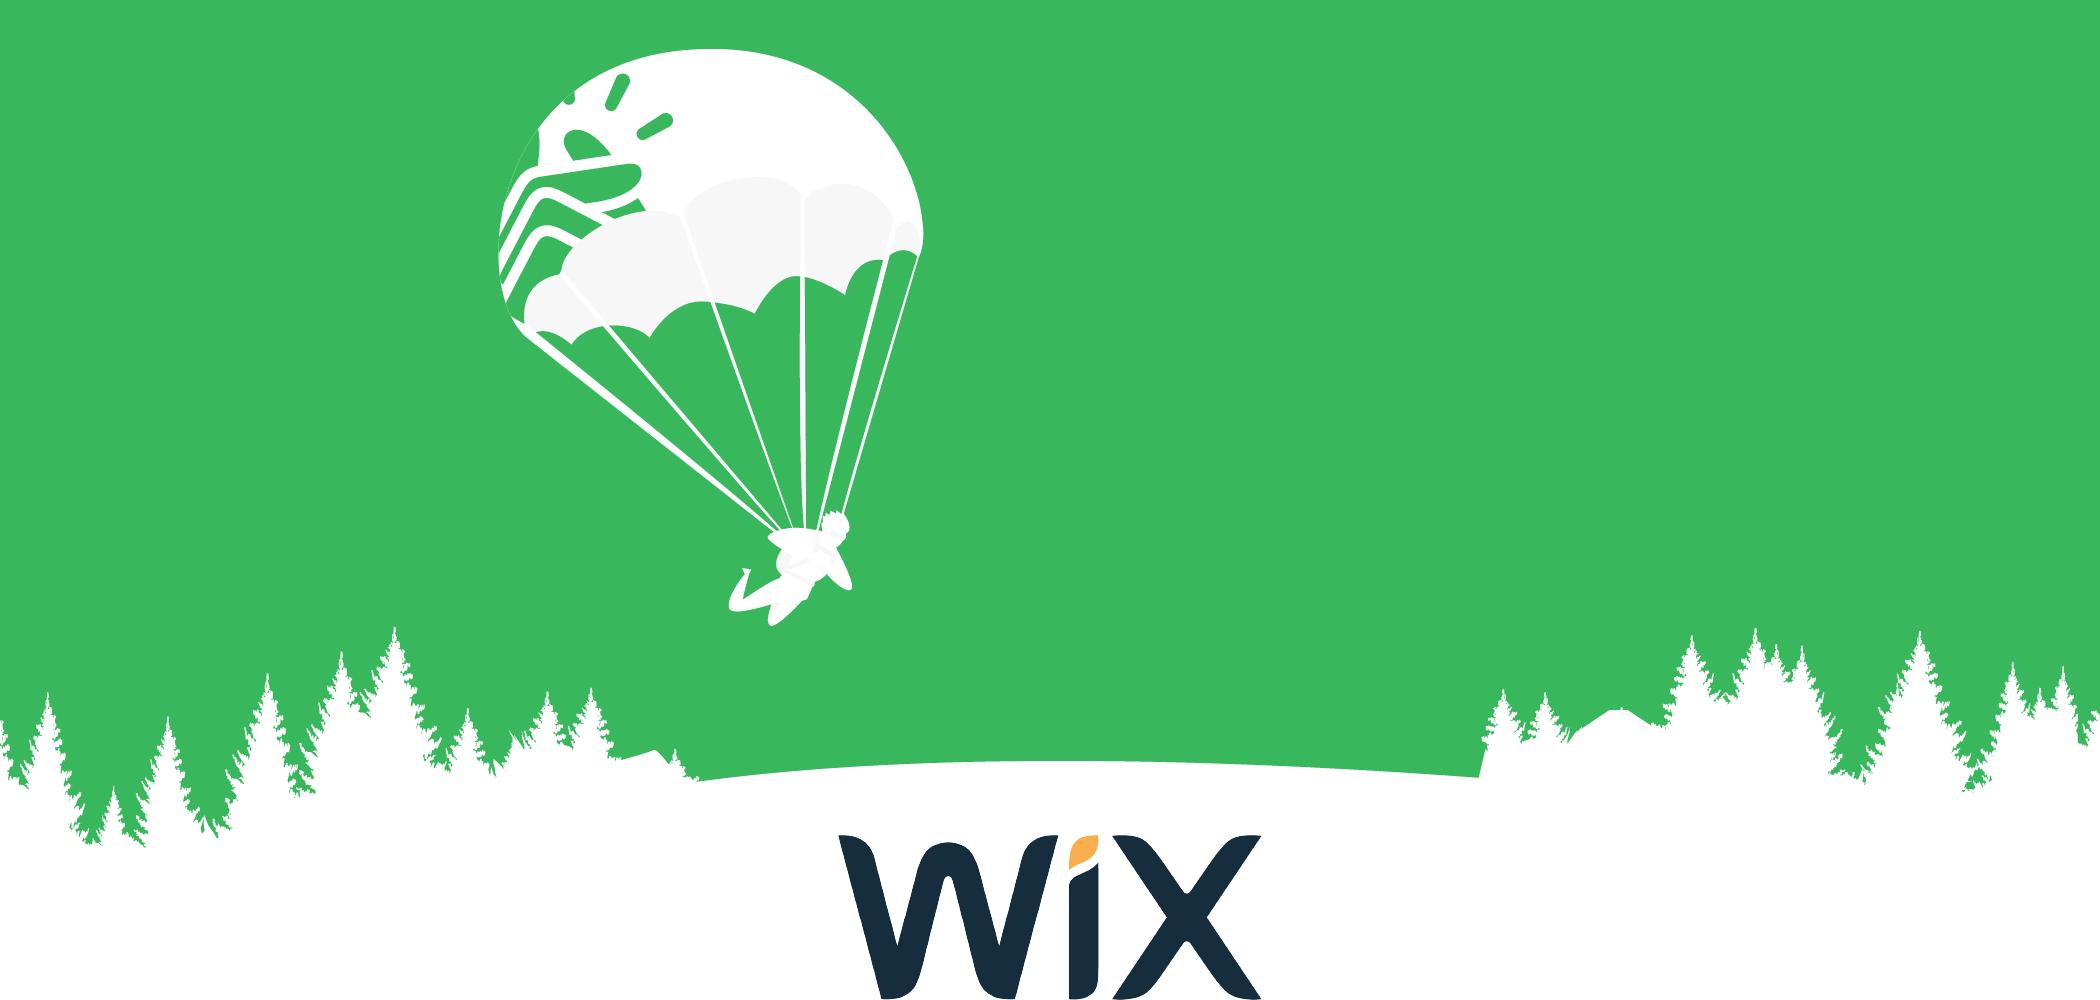 Wix is live on Printify!